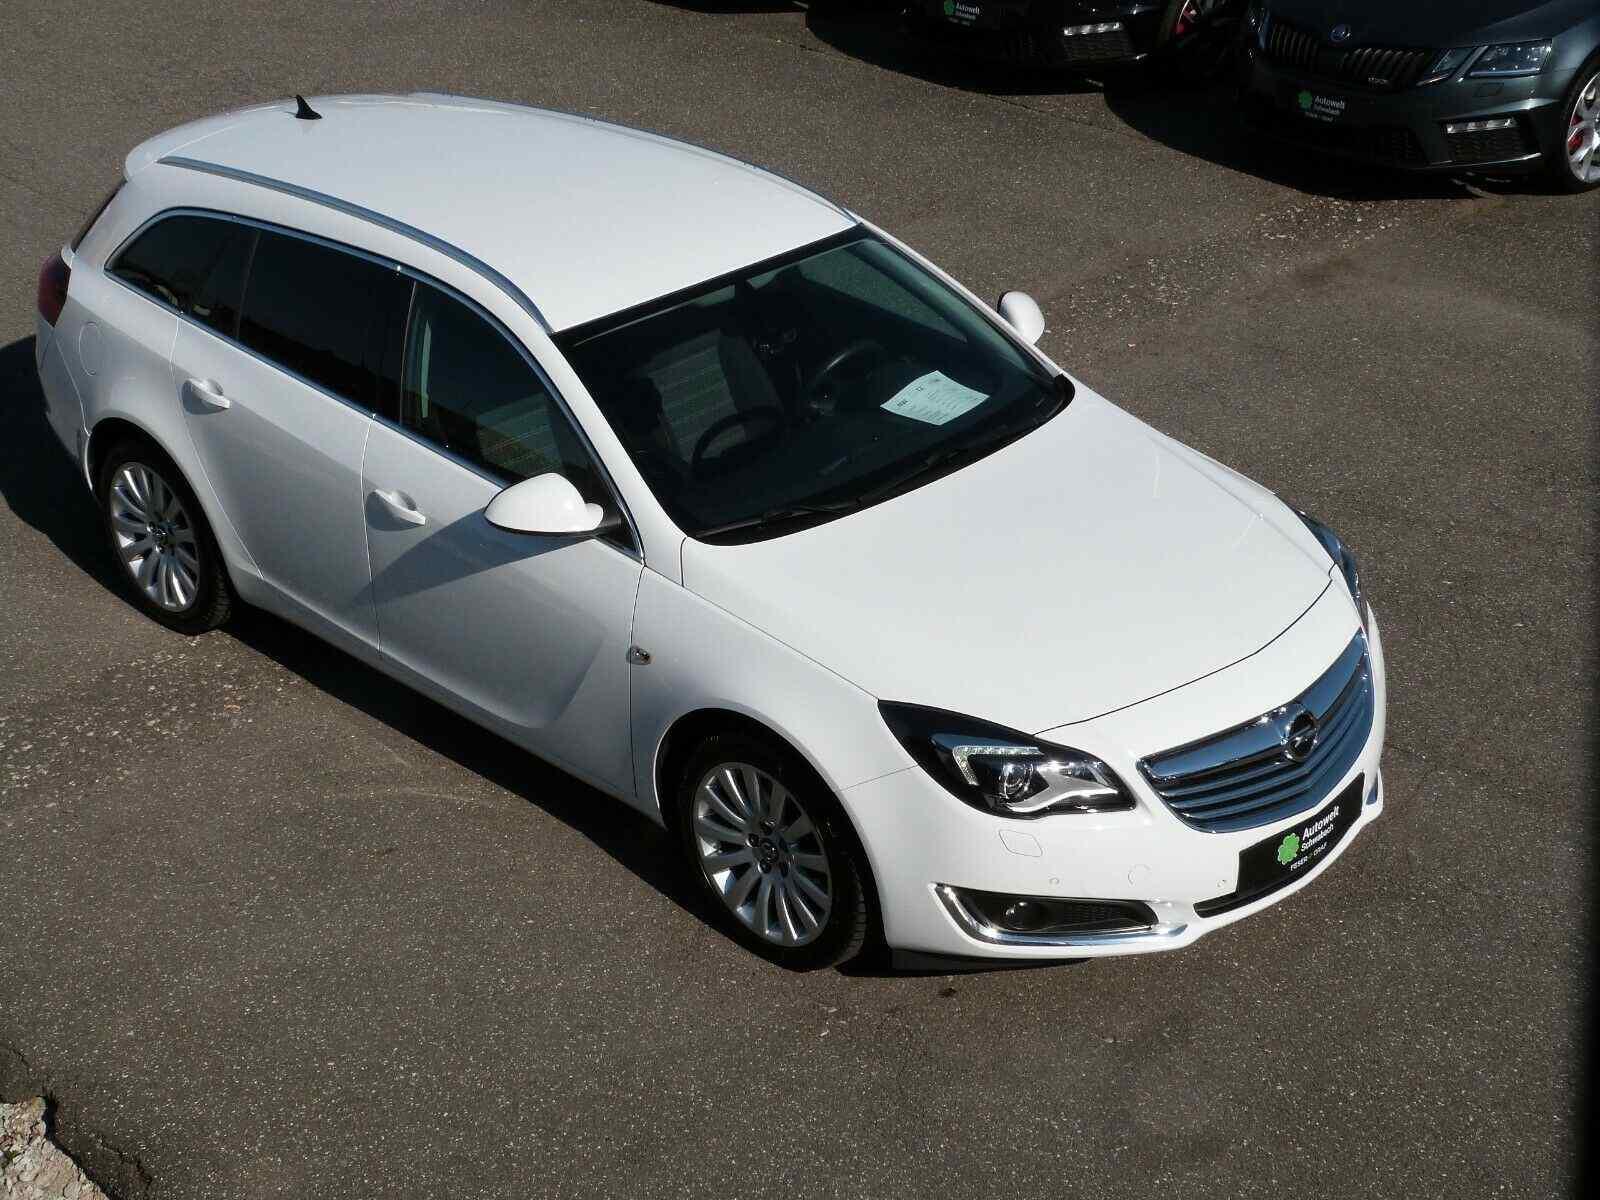 Opel Insignia Sports Tourer 2.0 CDTI NAVI XENON KAM, Jahr 2014, Diesel